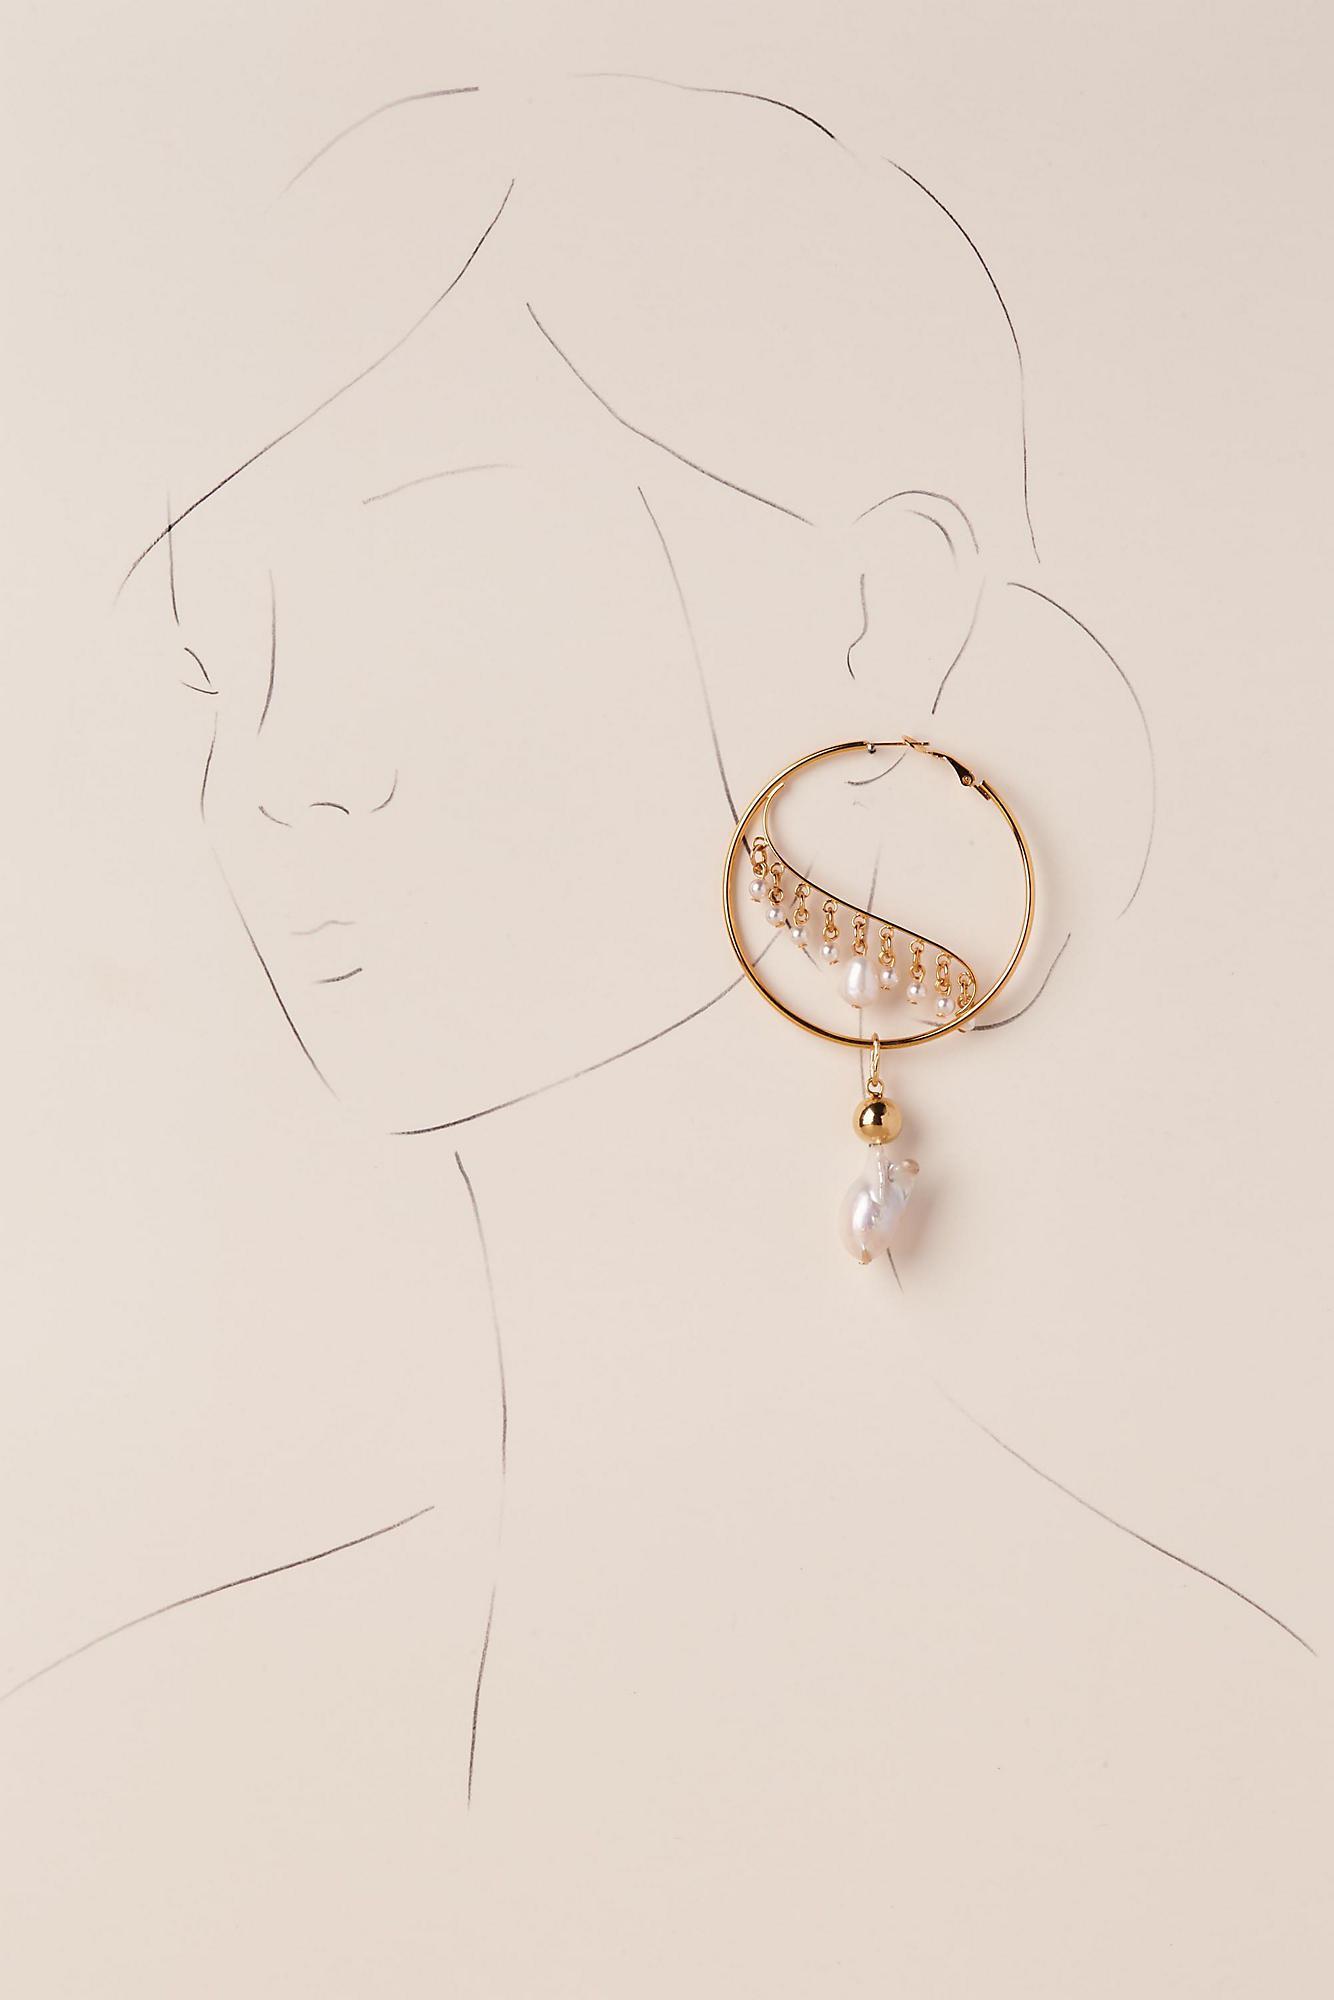 Anthropologie Ziva Hoop Earrings eZ0Imrq9